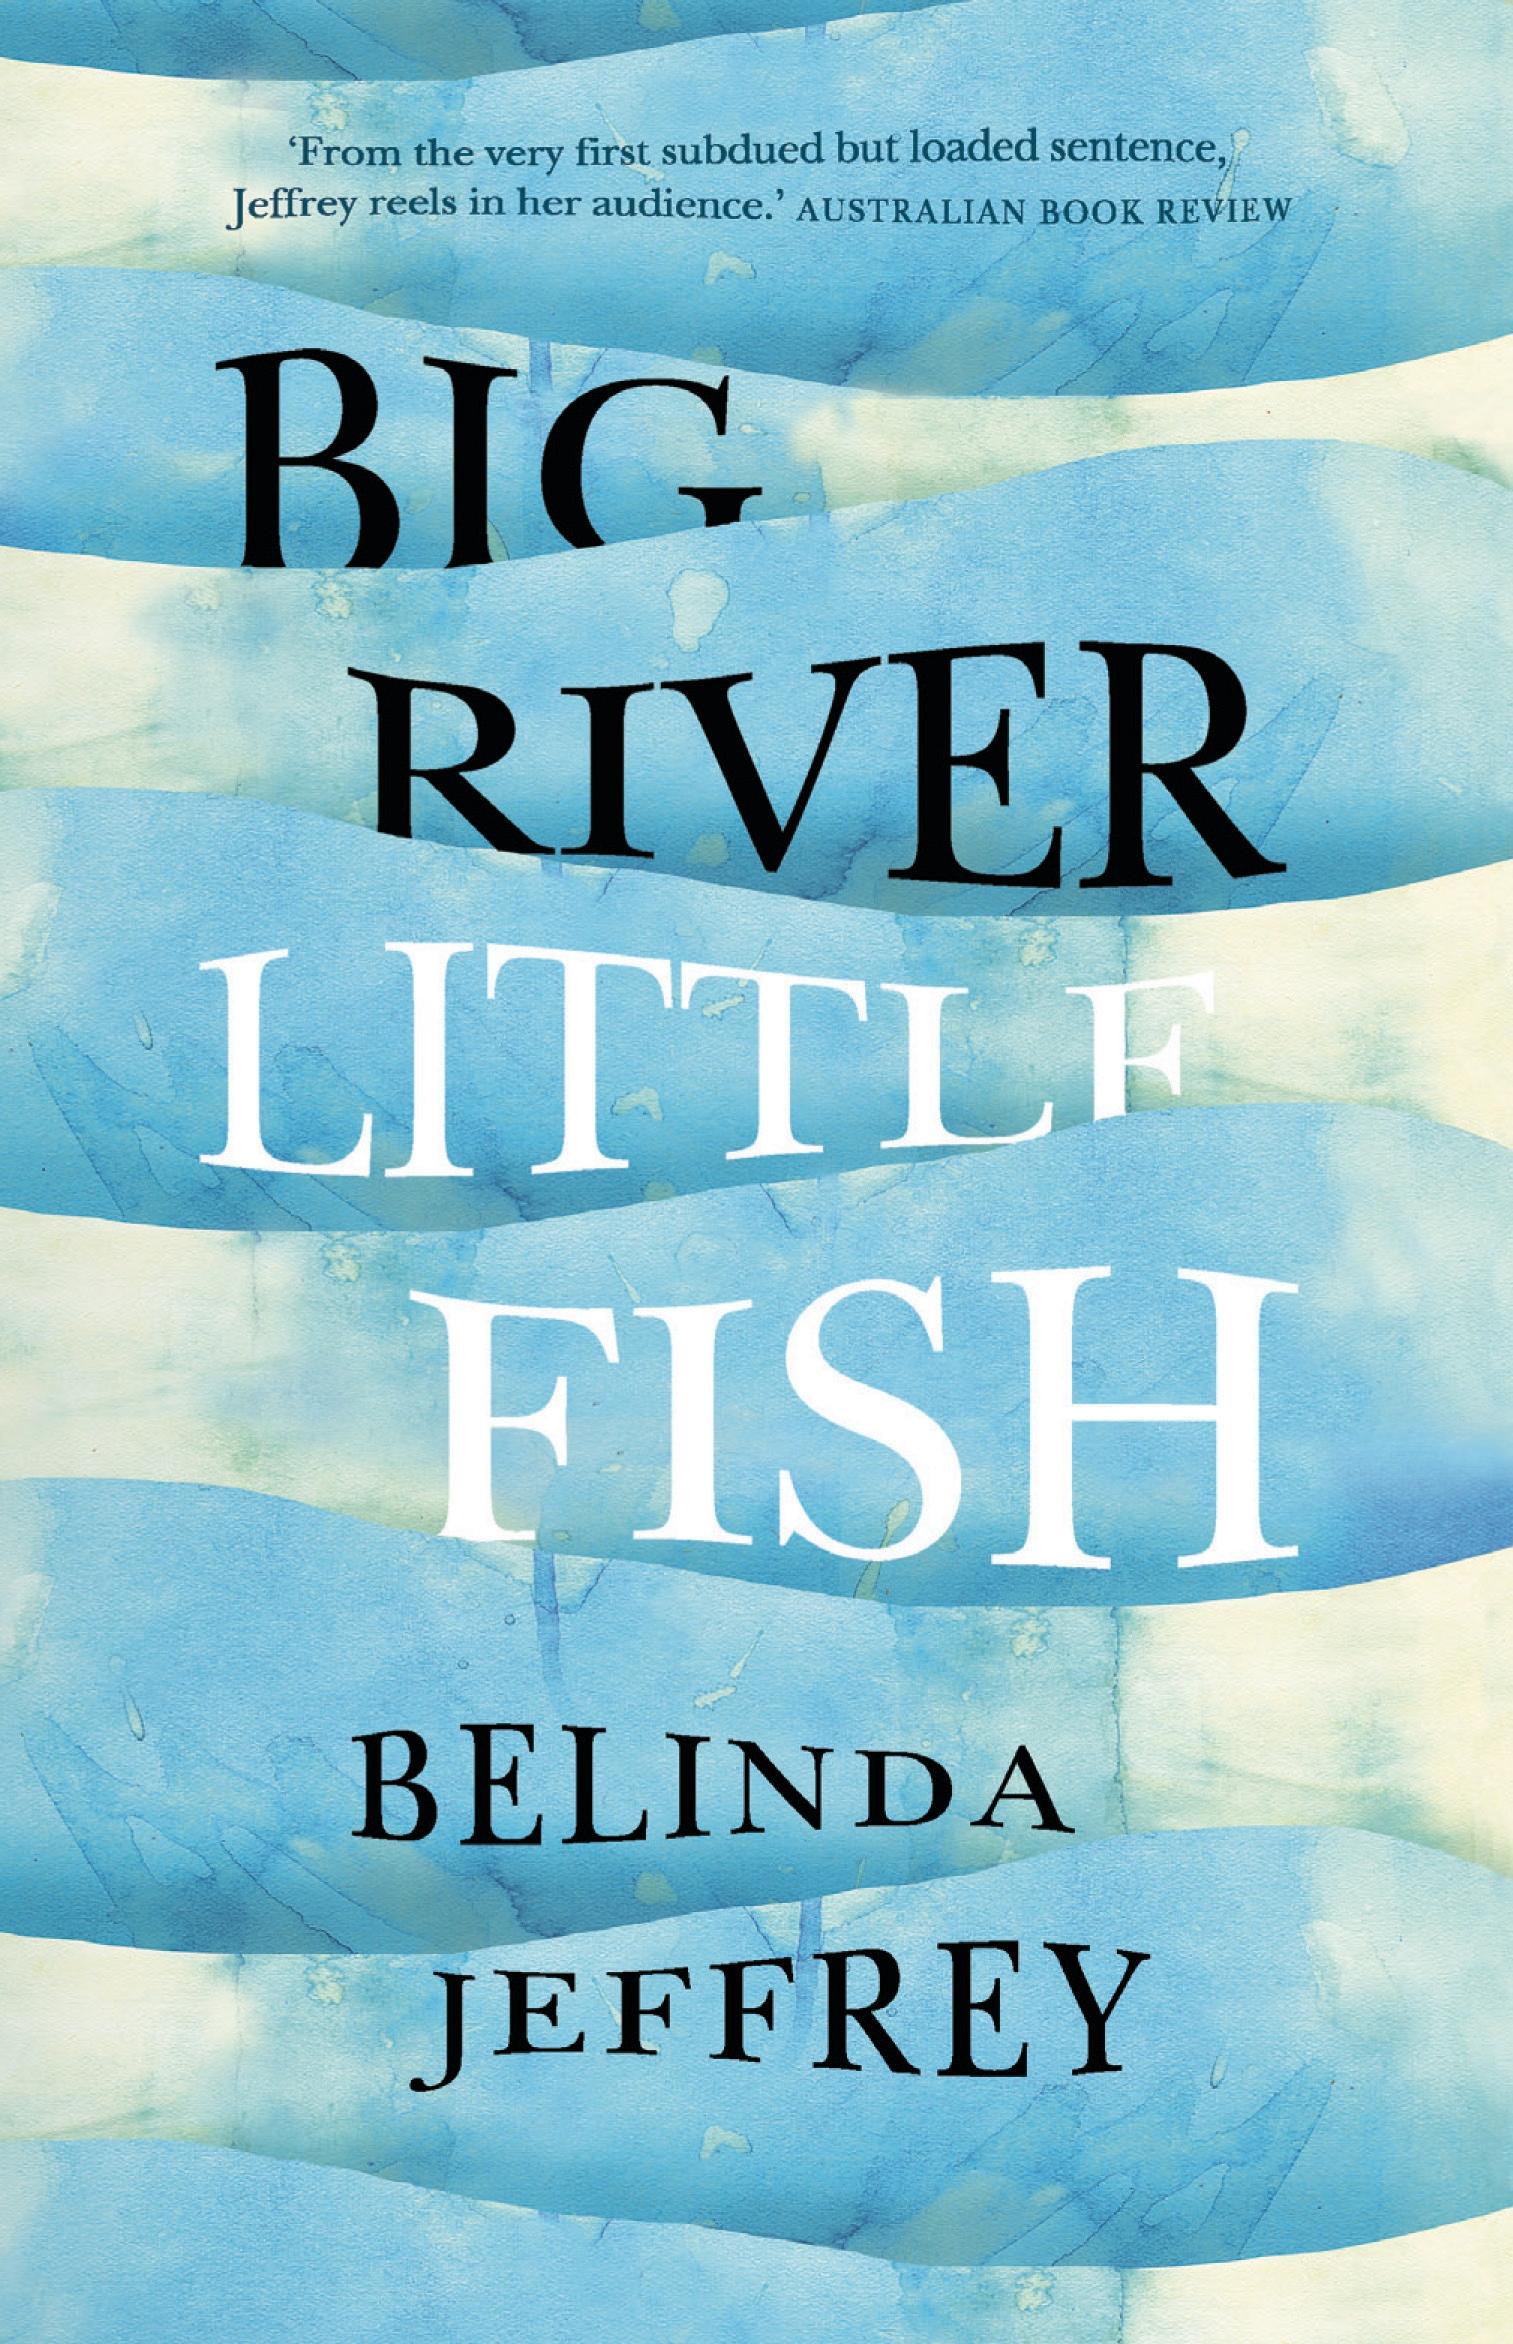 Big River Little Fish